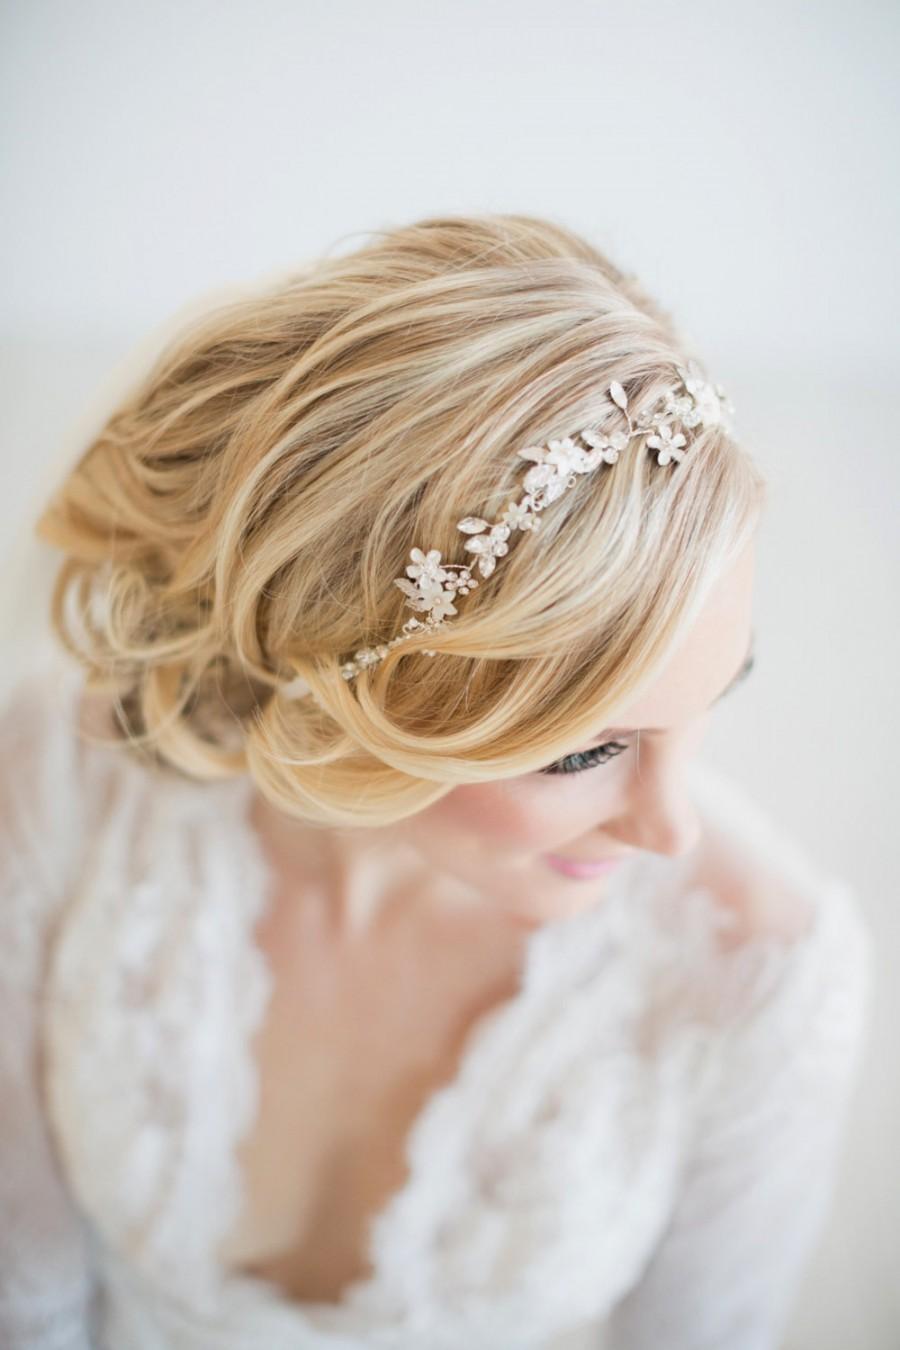 Wedding - Wedding Floral Hair Vine,  Silver Wedding Hair Vine, Gold Bridal Headpiece, Boho Headpiece, Bridal Hairpiece, Floral Wedding Hair Accessory